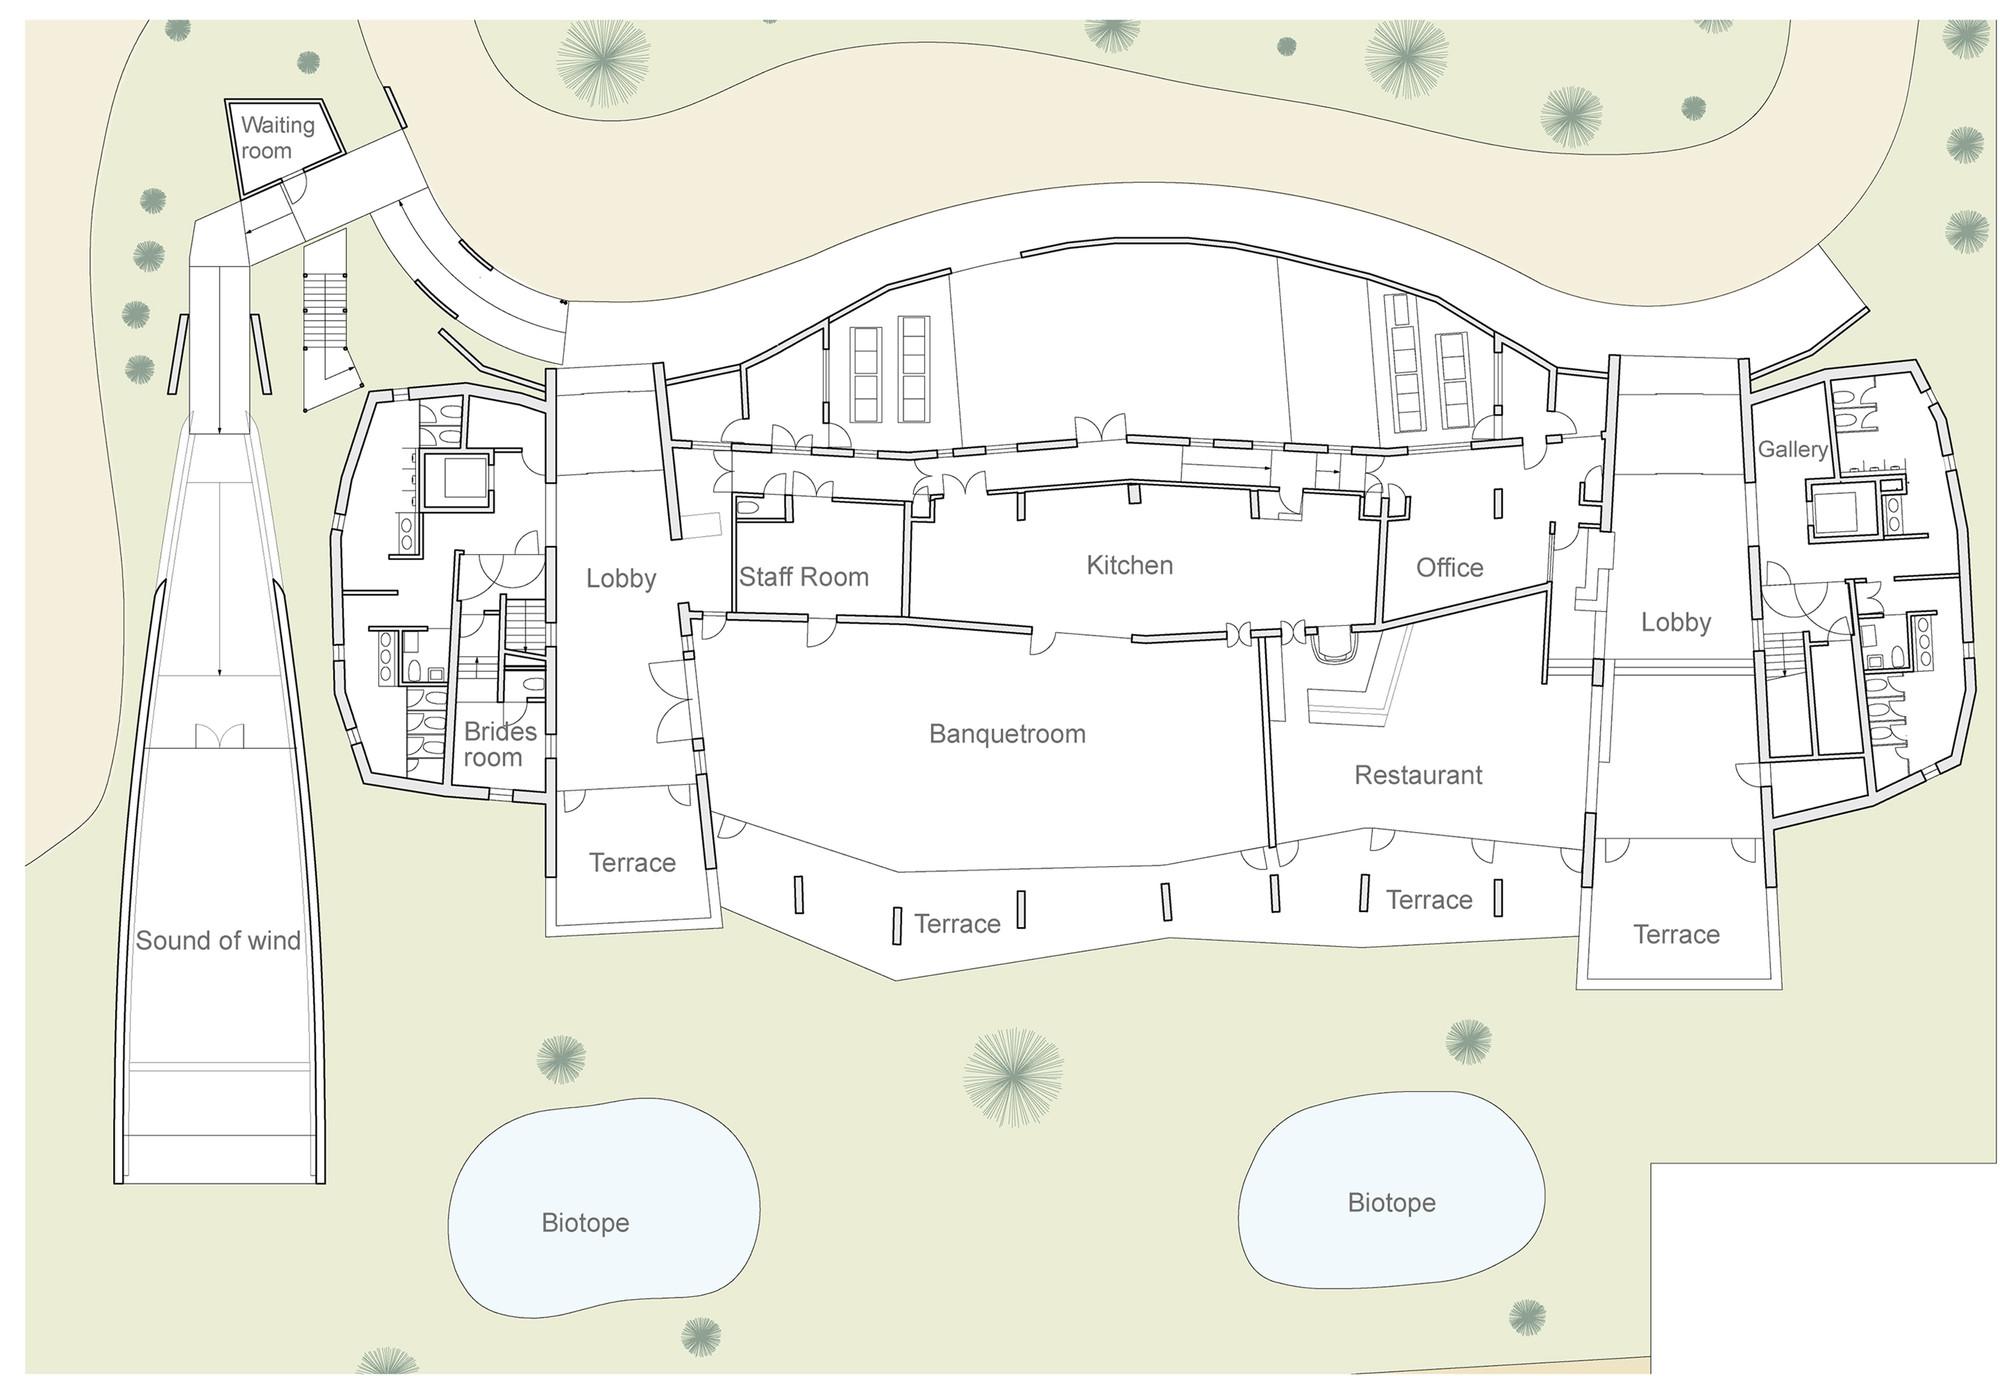 ecotone hotel in biwako sound of wind ryuichi ashizawa hotel ground floor plan